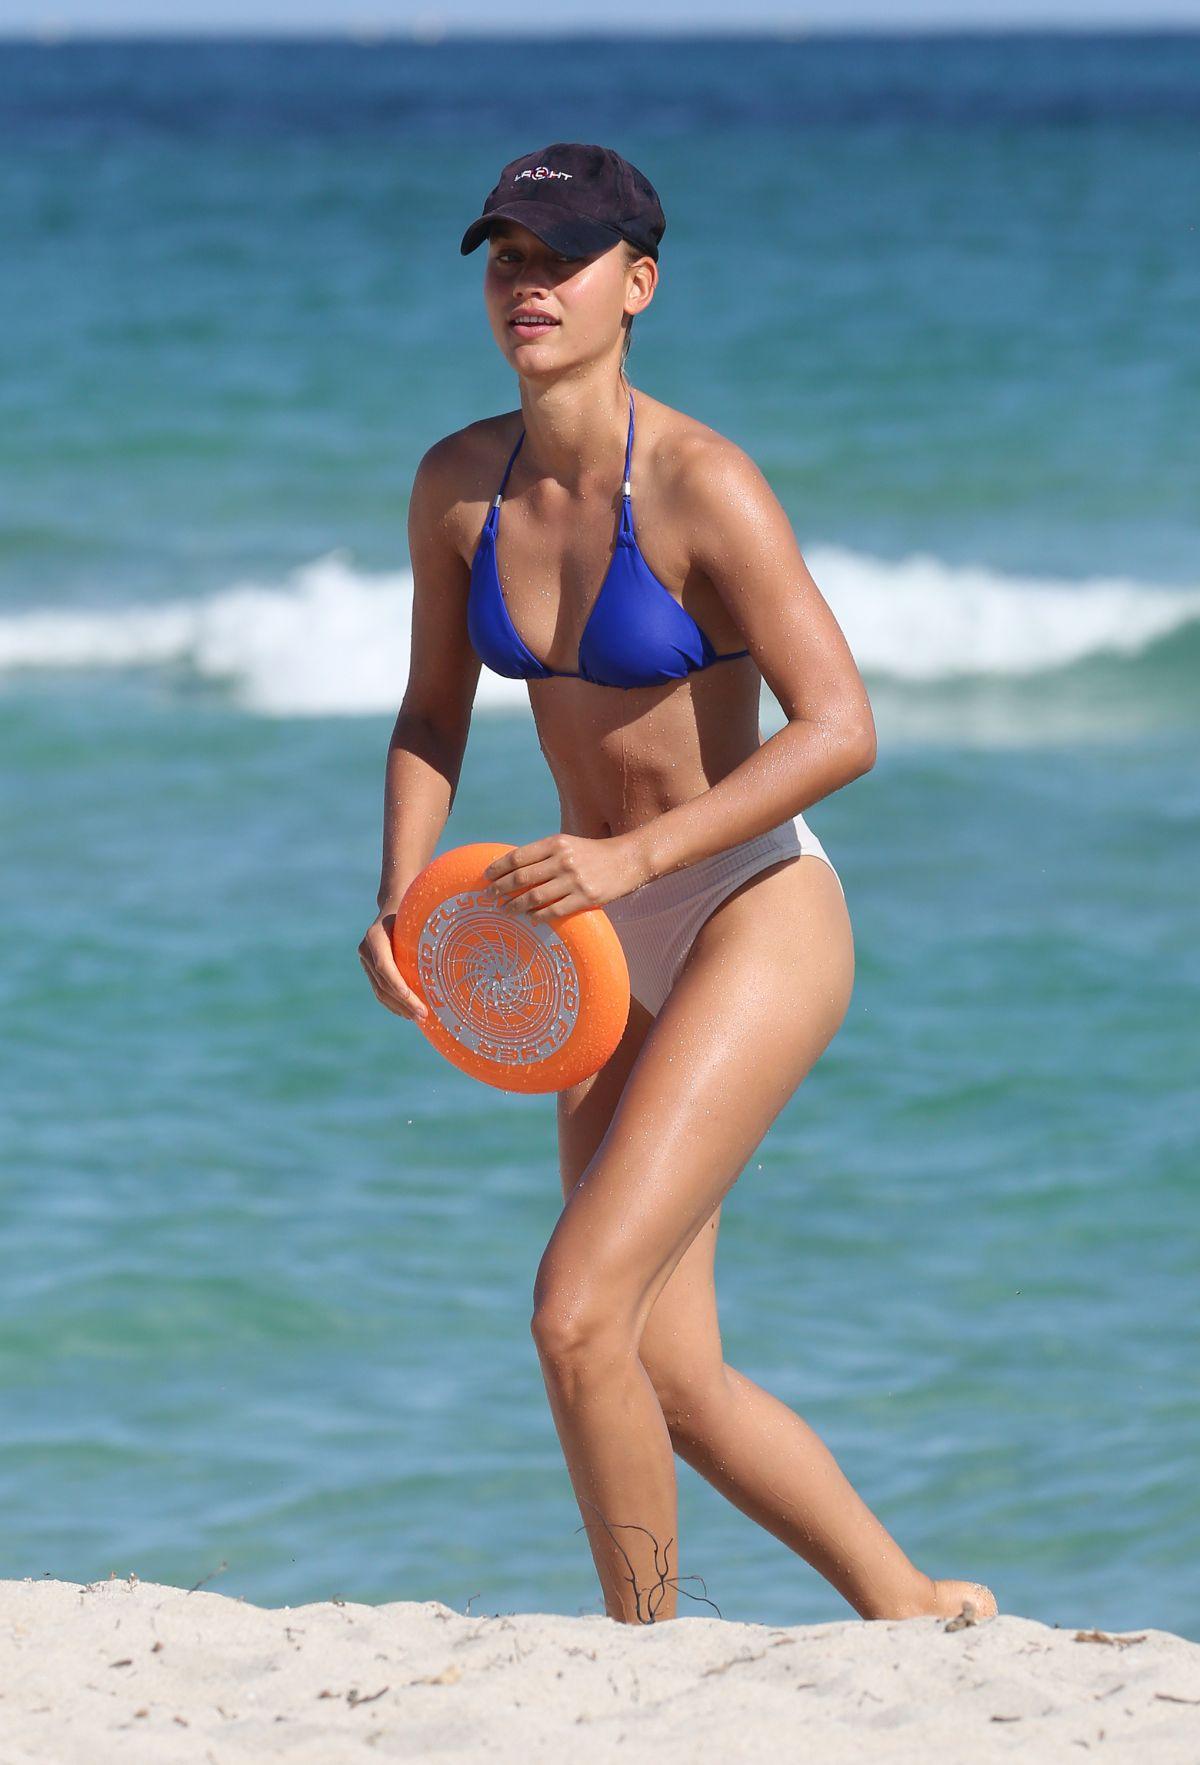 Chase Carter in Bikini at the beach in Miami Pic 3 of 35